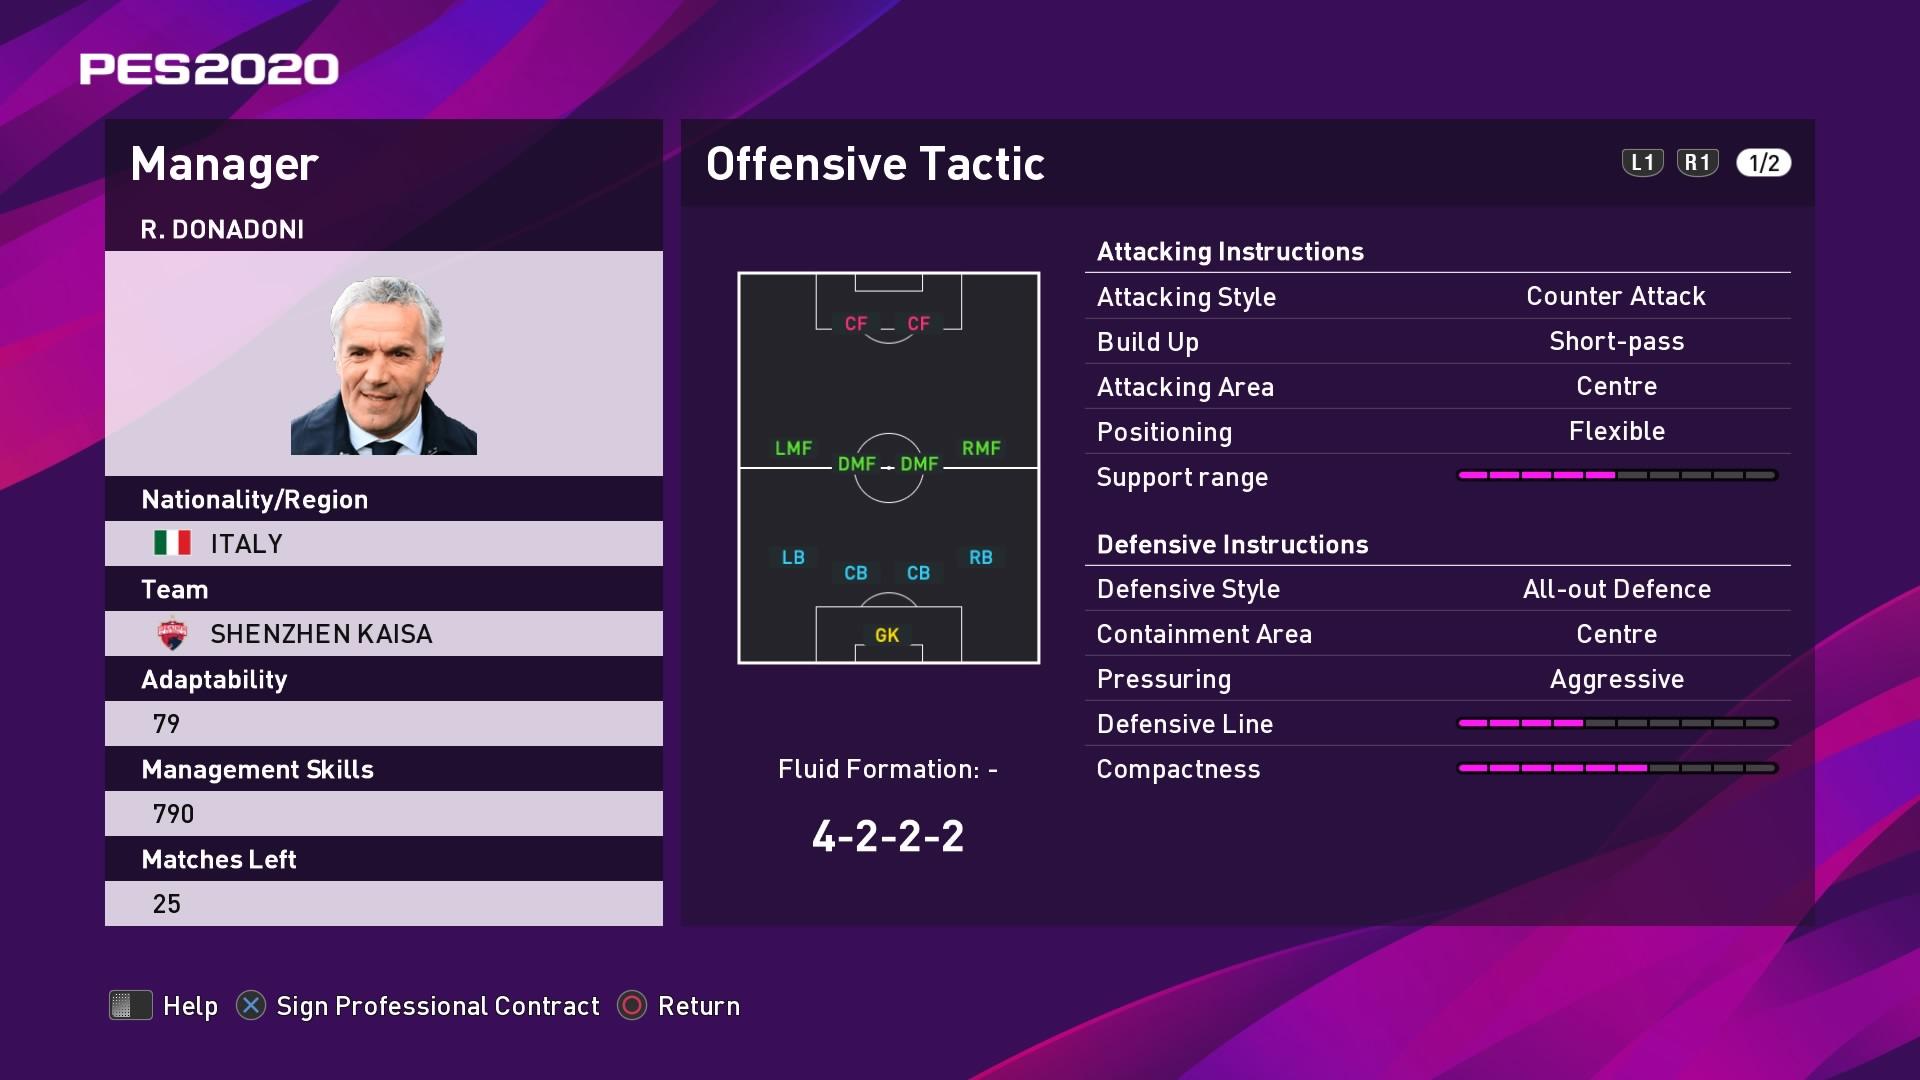 R. Donadoni (Roberto Donadoni) Offensive Tactic in PES 2020 myClub